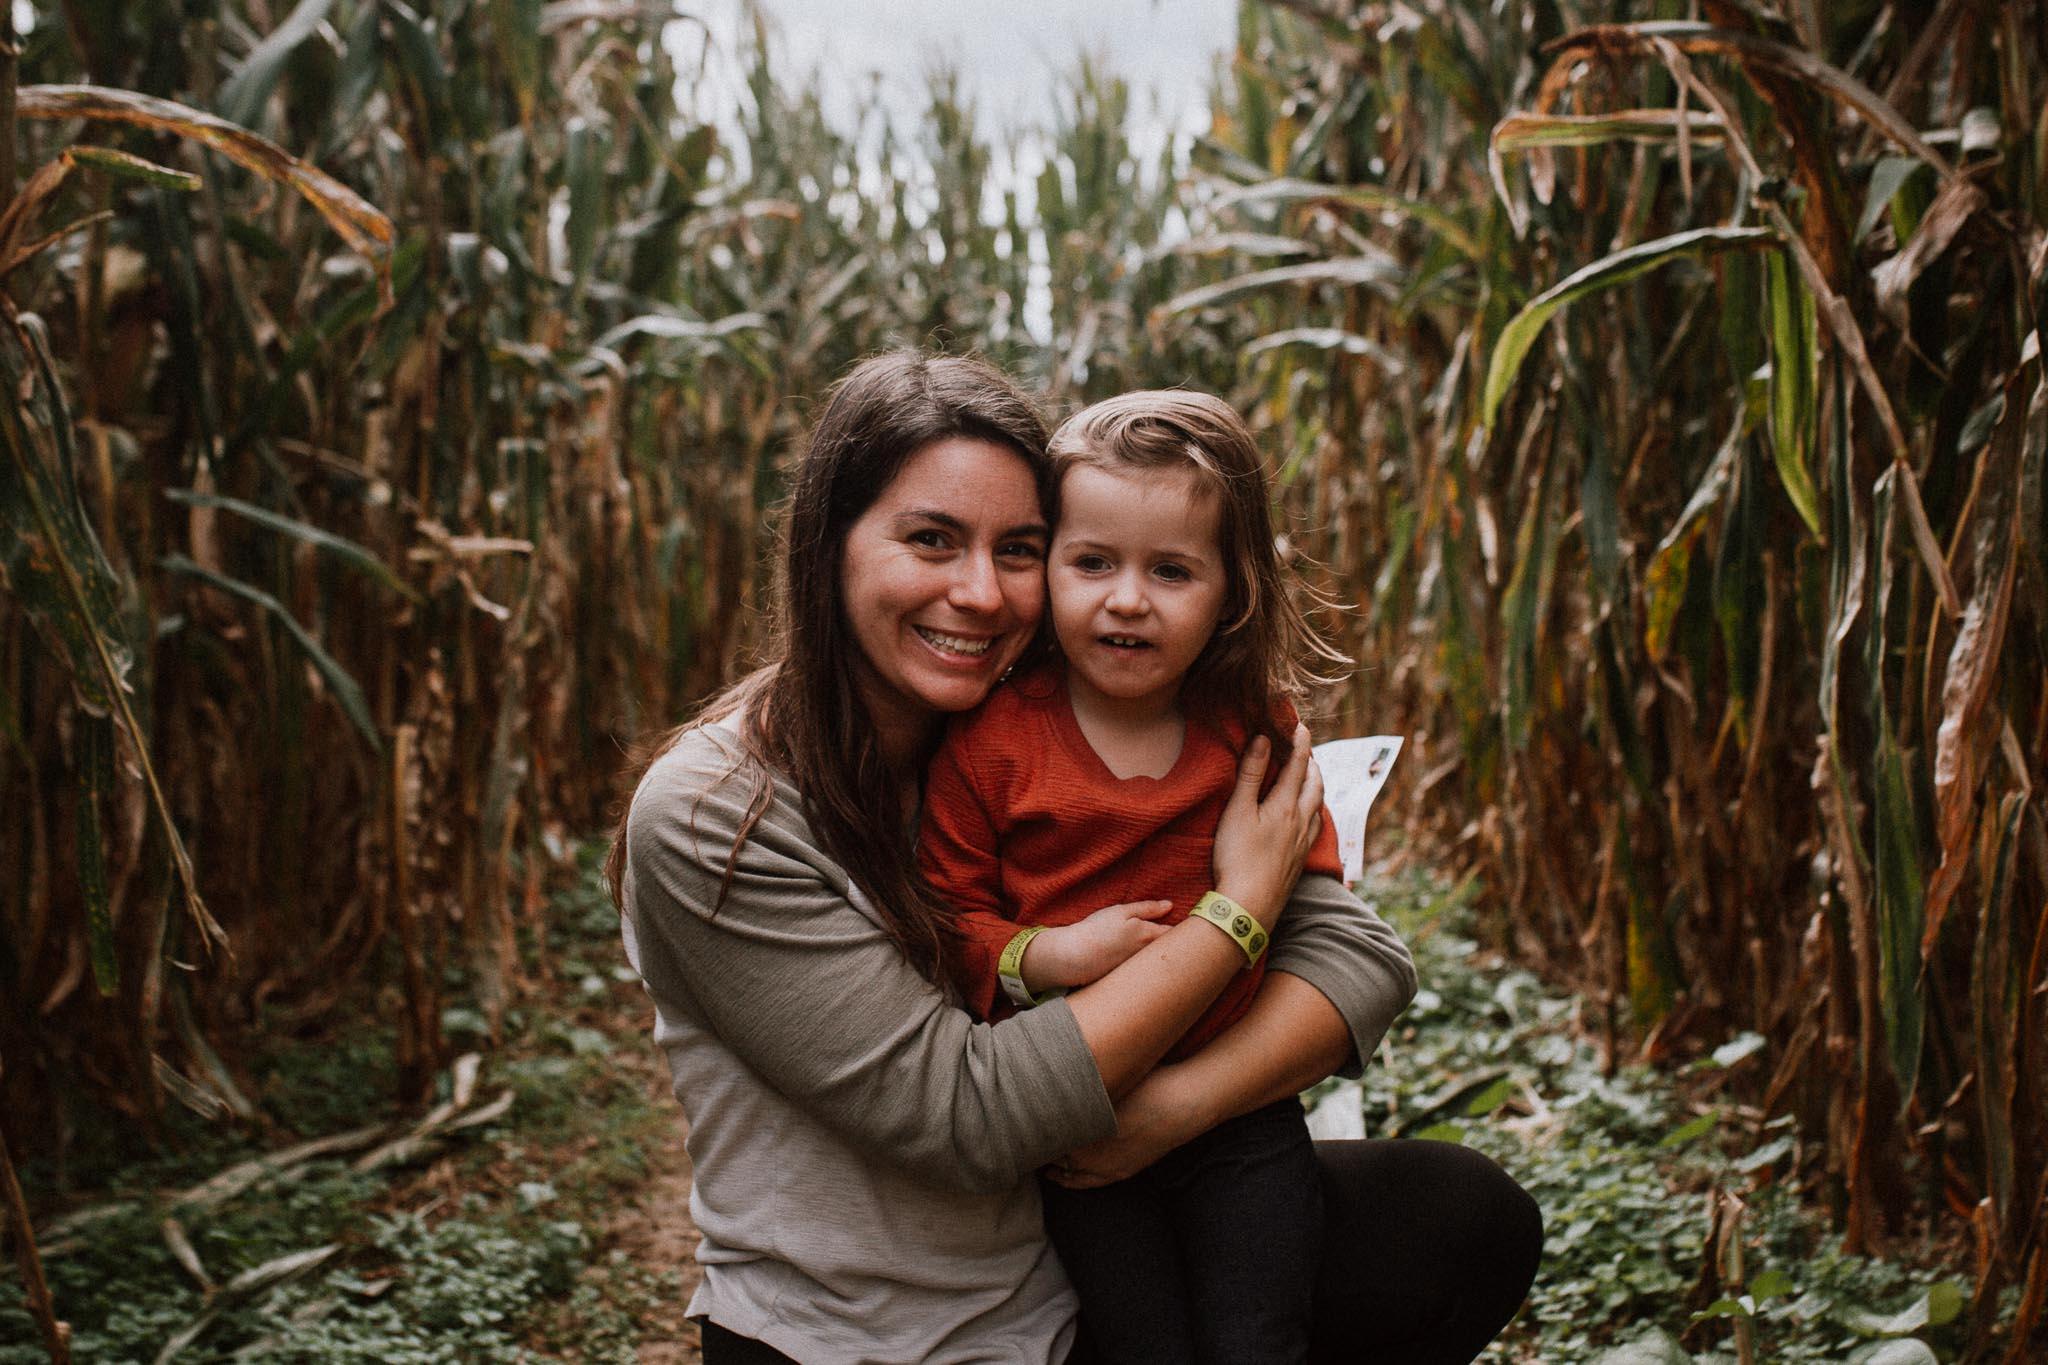 mother daughter toddler corn maze Ashburn Loudoun Virginia Lifestyle Documentary Family Marti Austin Photography